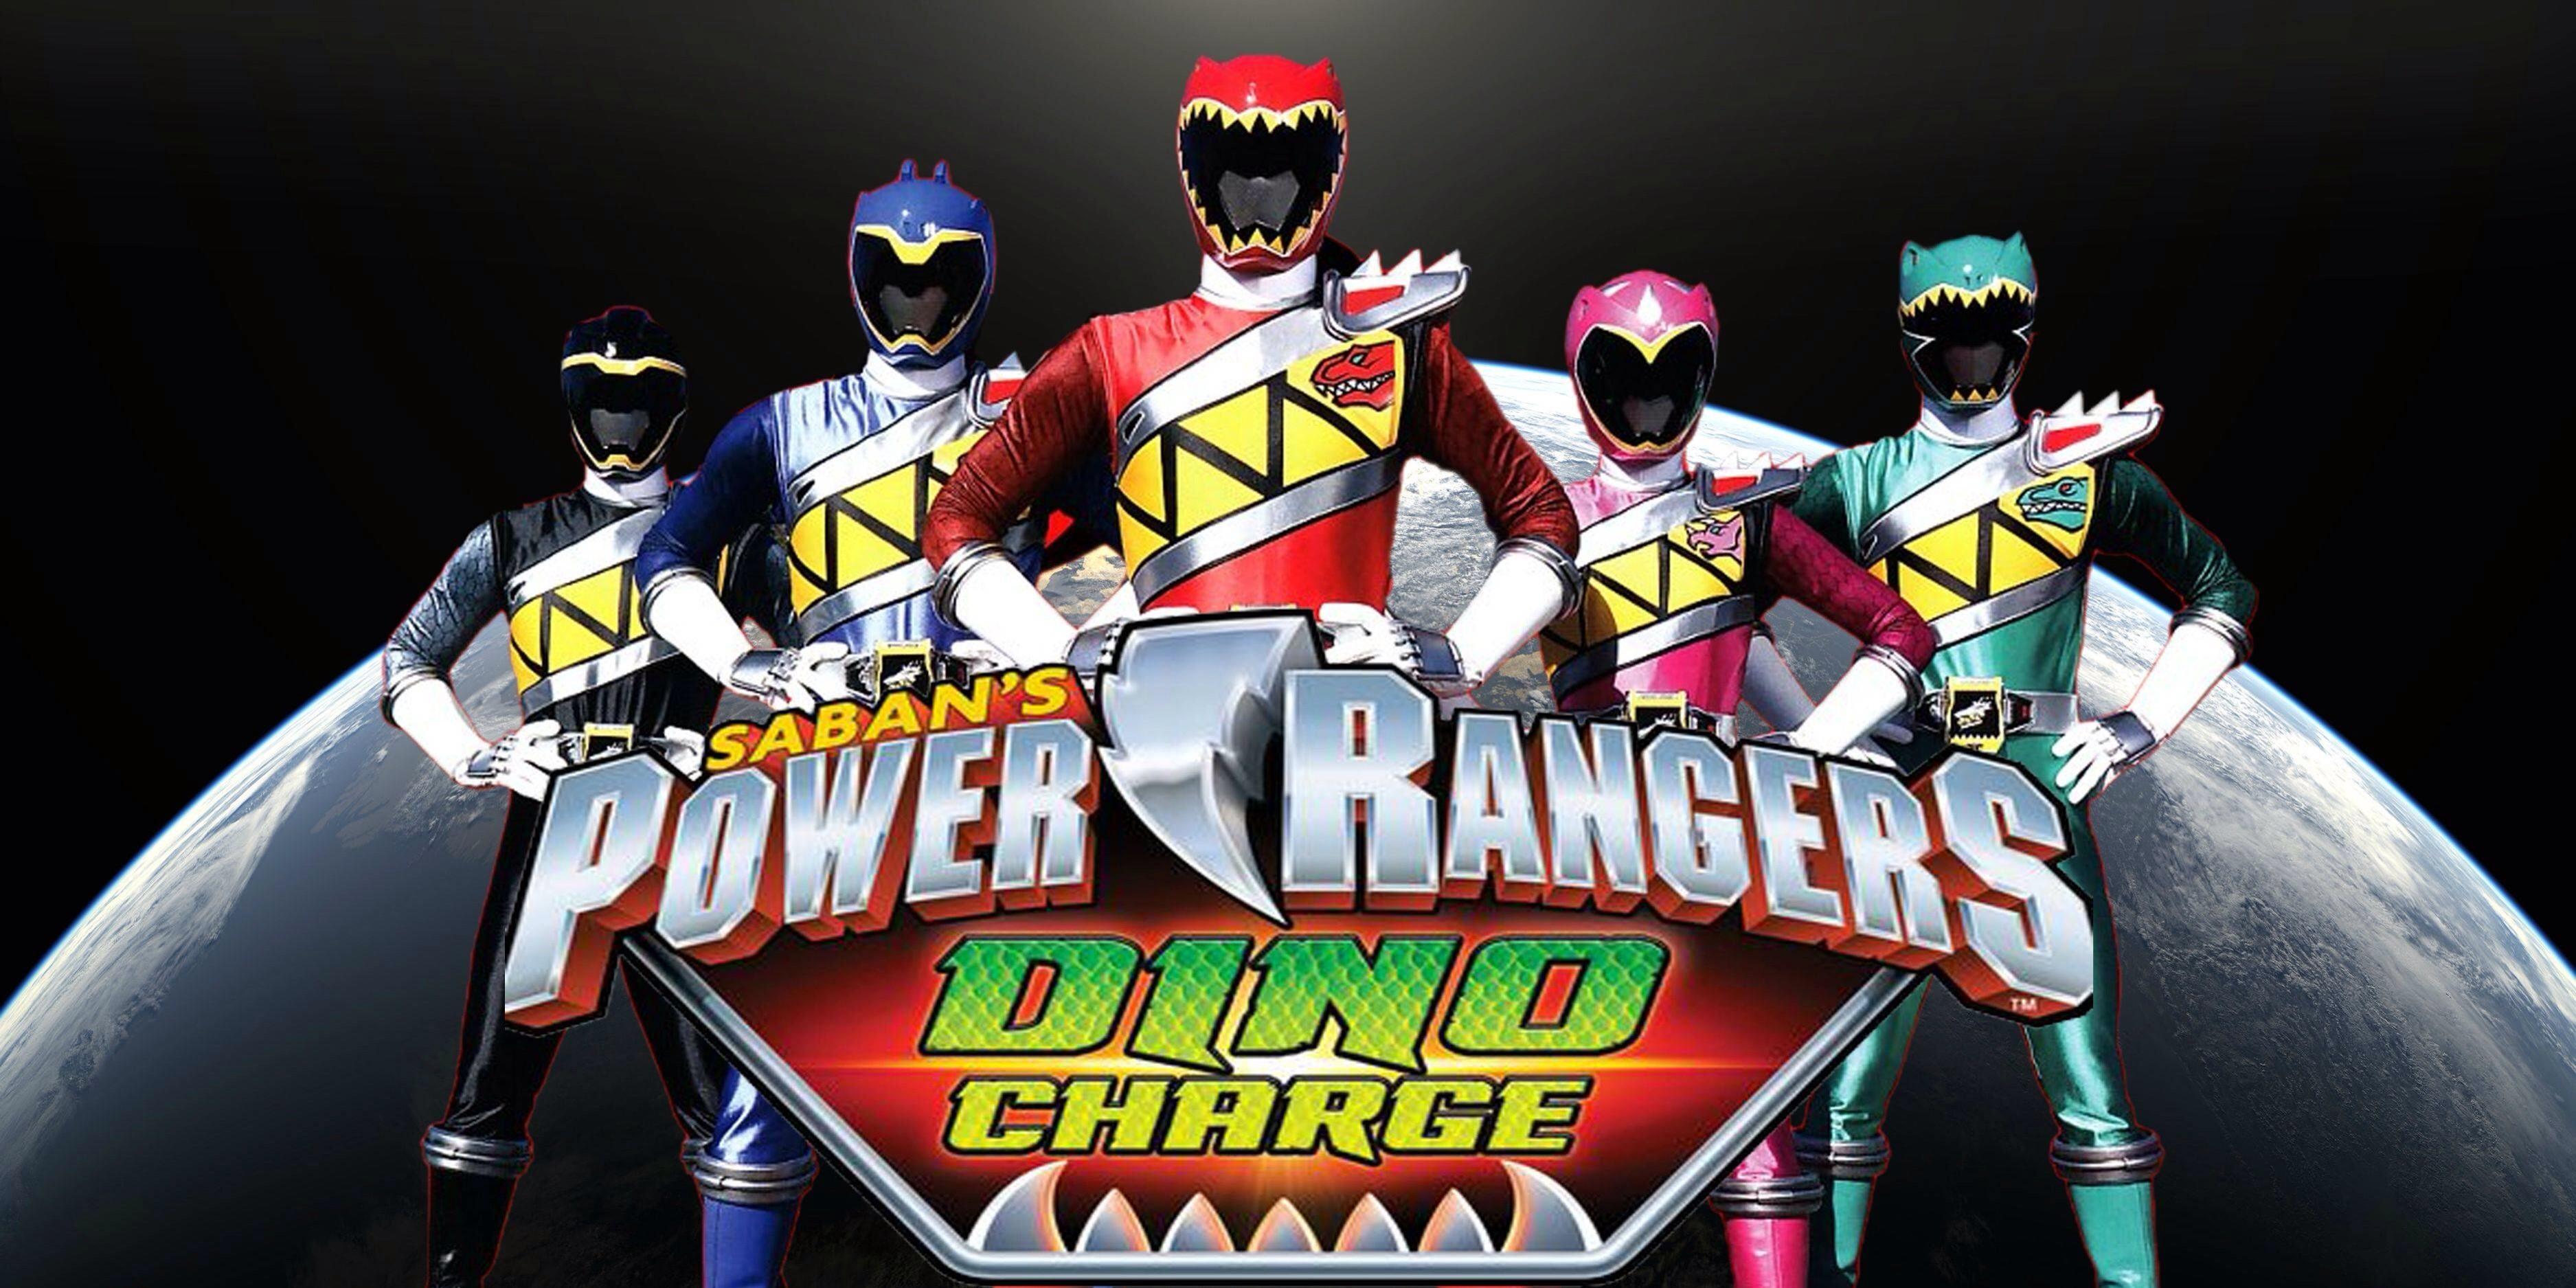 Power Rangers Dino Charge Wallpaper – WallpaperSafari